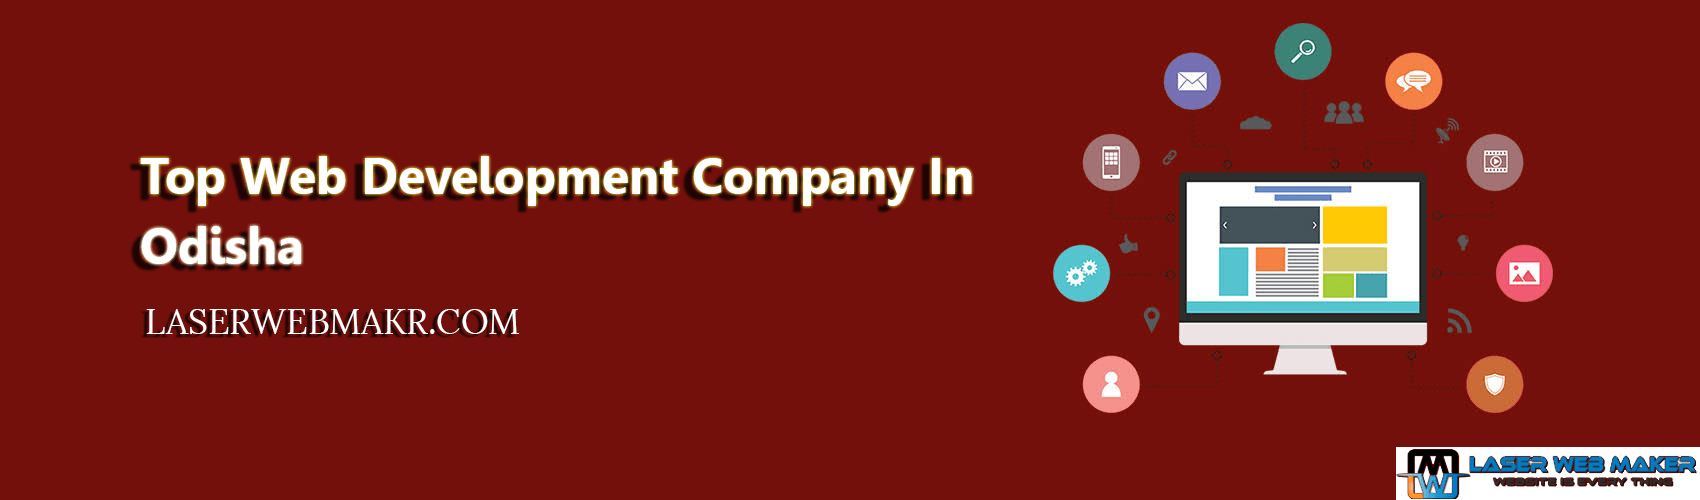 Top Web Development Company In Odisha